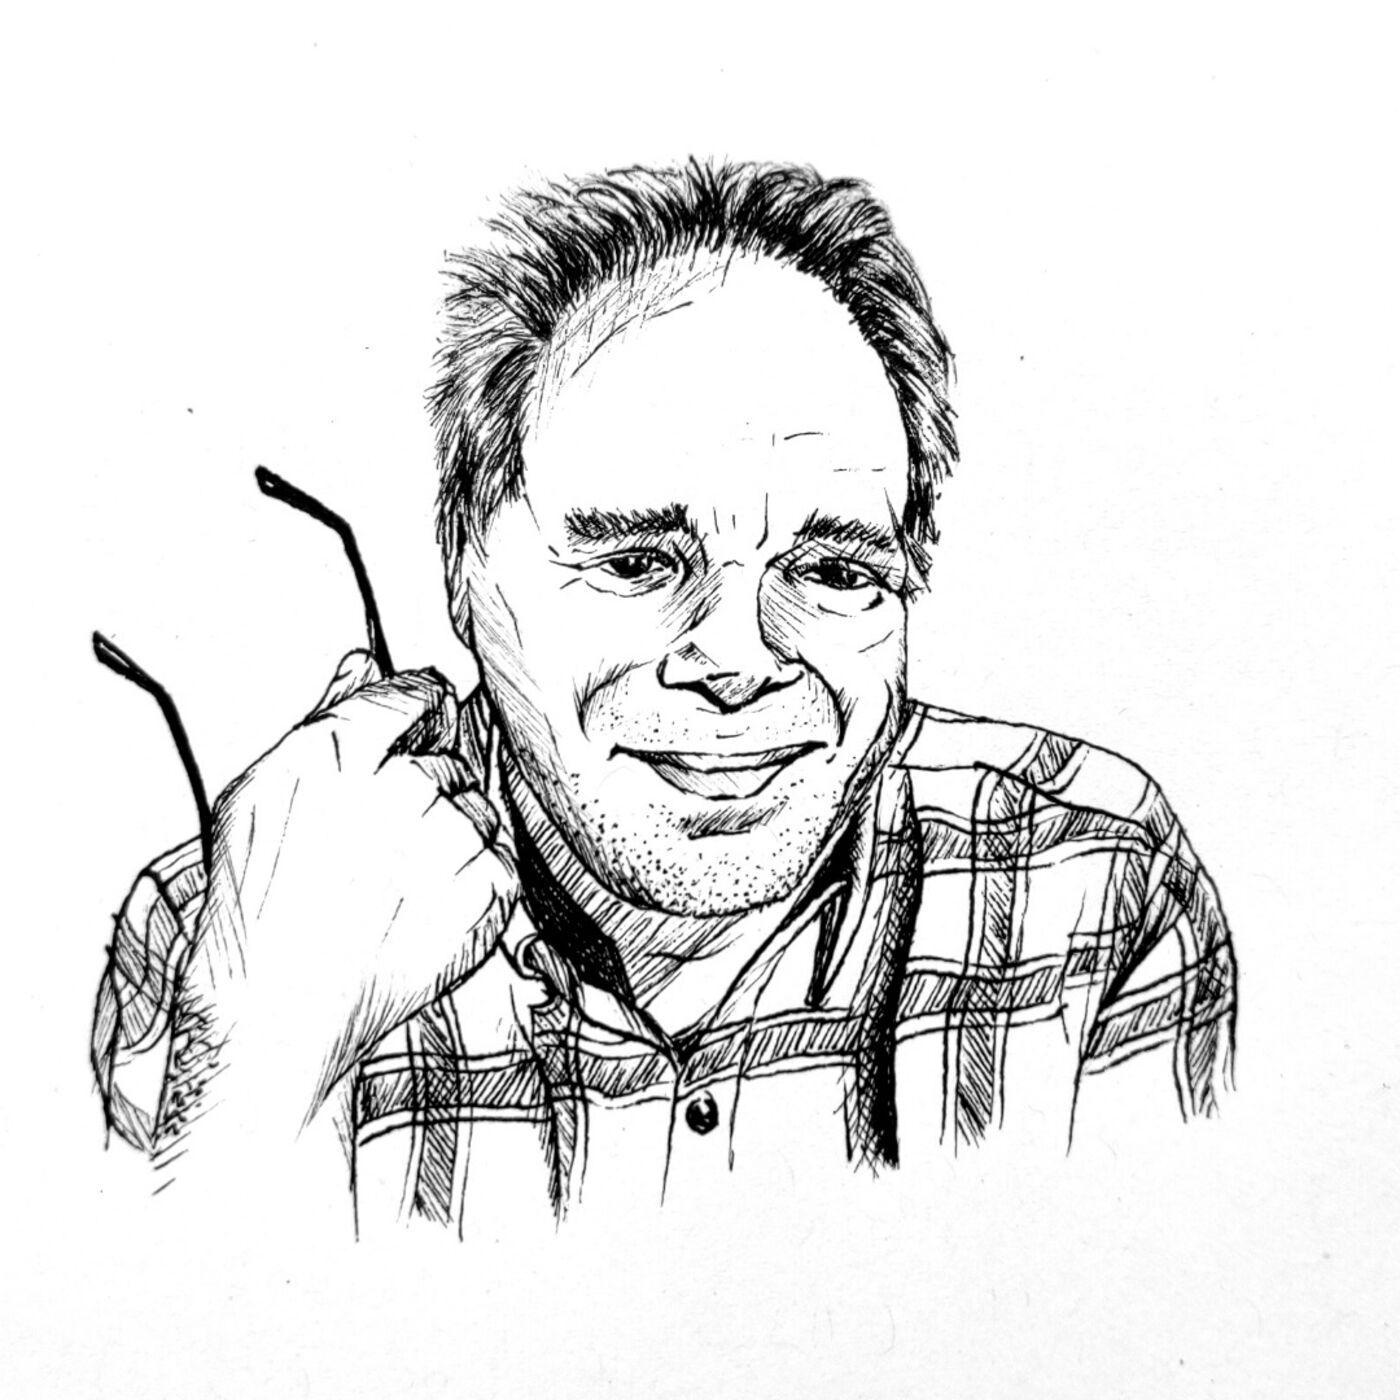 Episode 6: Bill Kauffman & repairing communal life in America